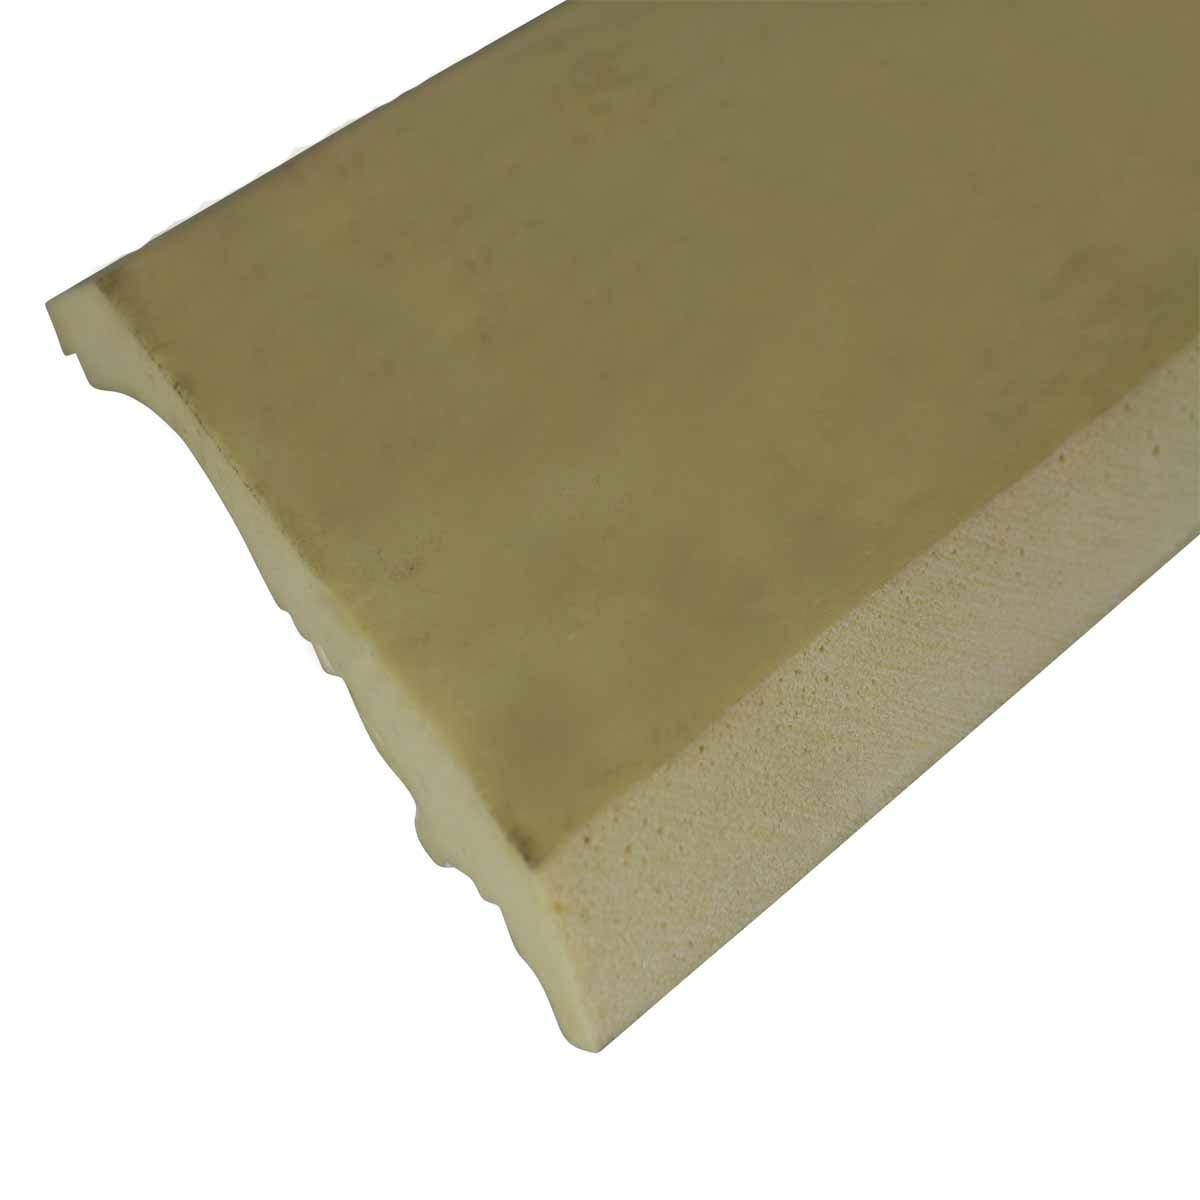 Cornice White Urethane Sample of 12410 24 Cornice Cornice Moulding Cornice Molding